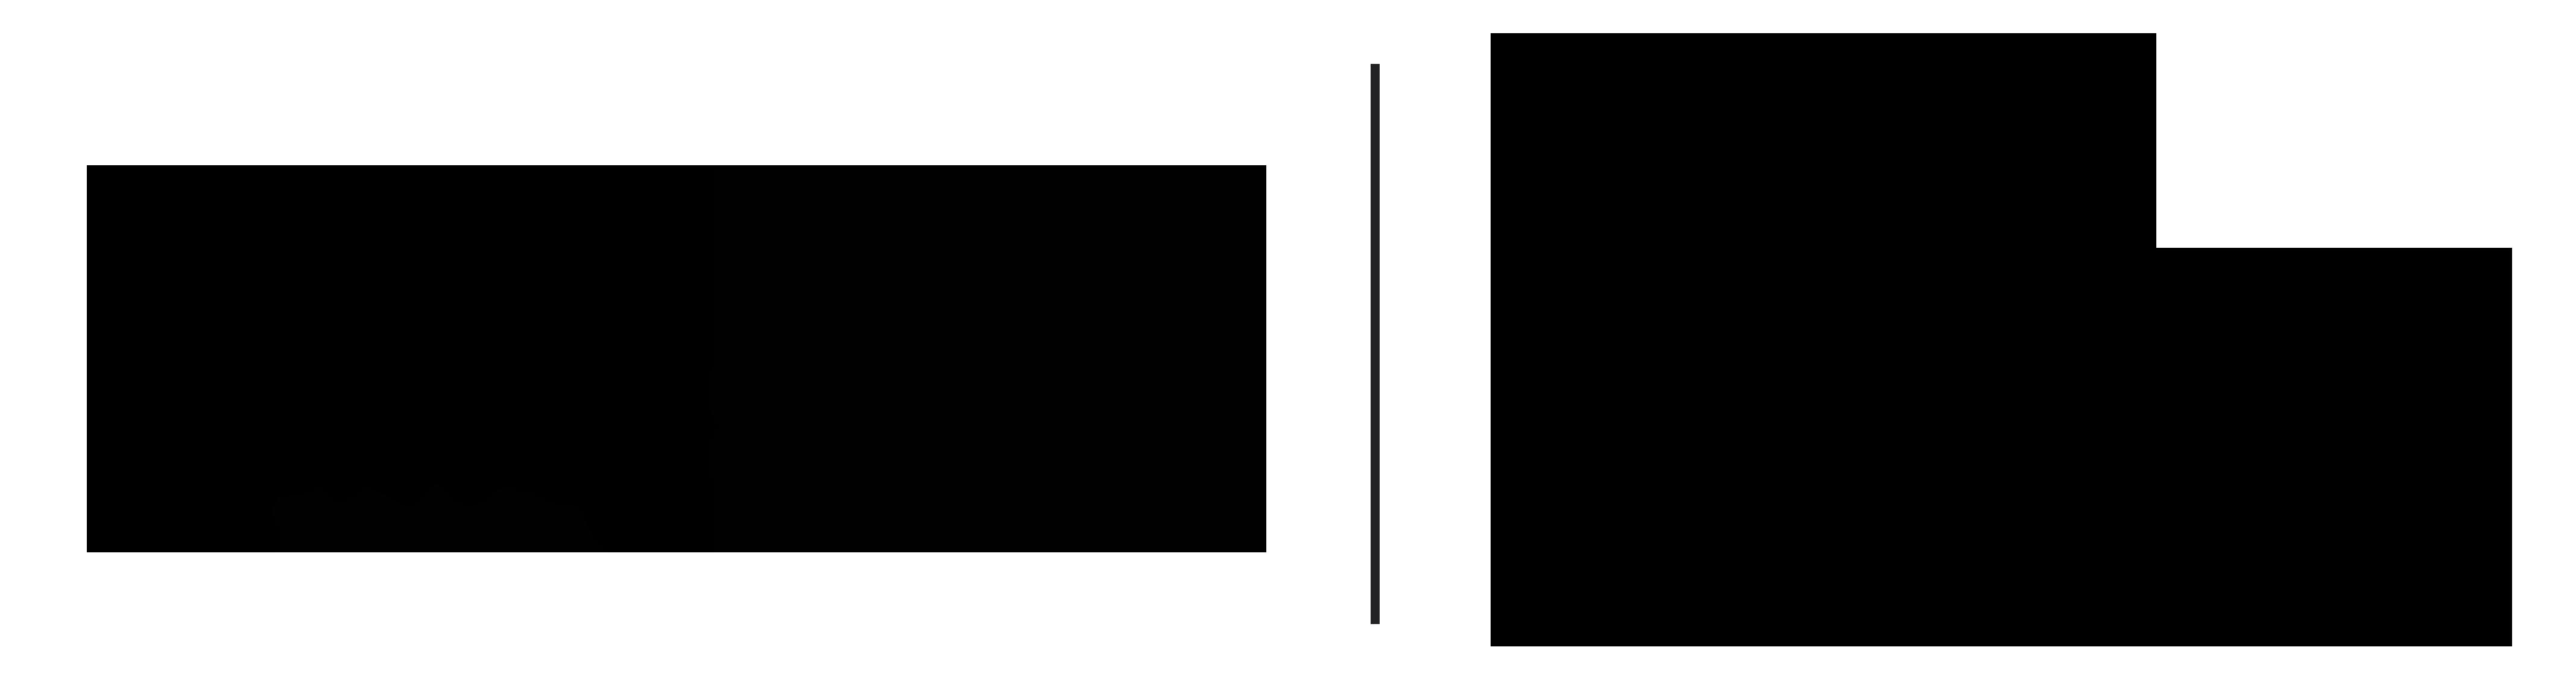 Austin Sizemore Team | Keller Williams Realty logo